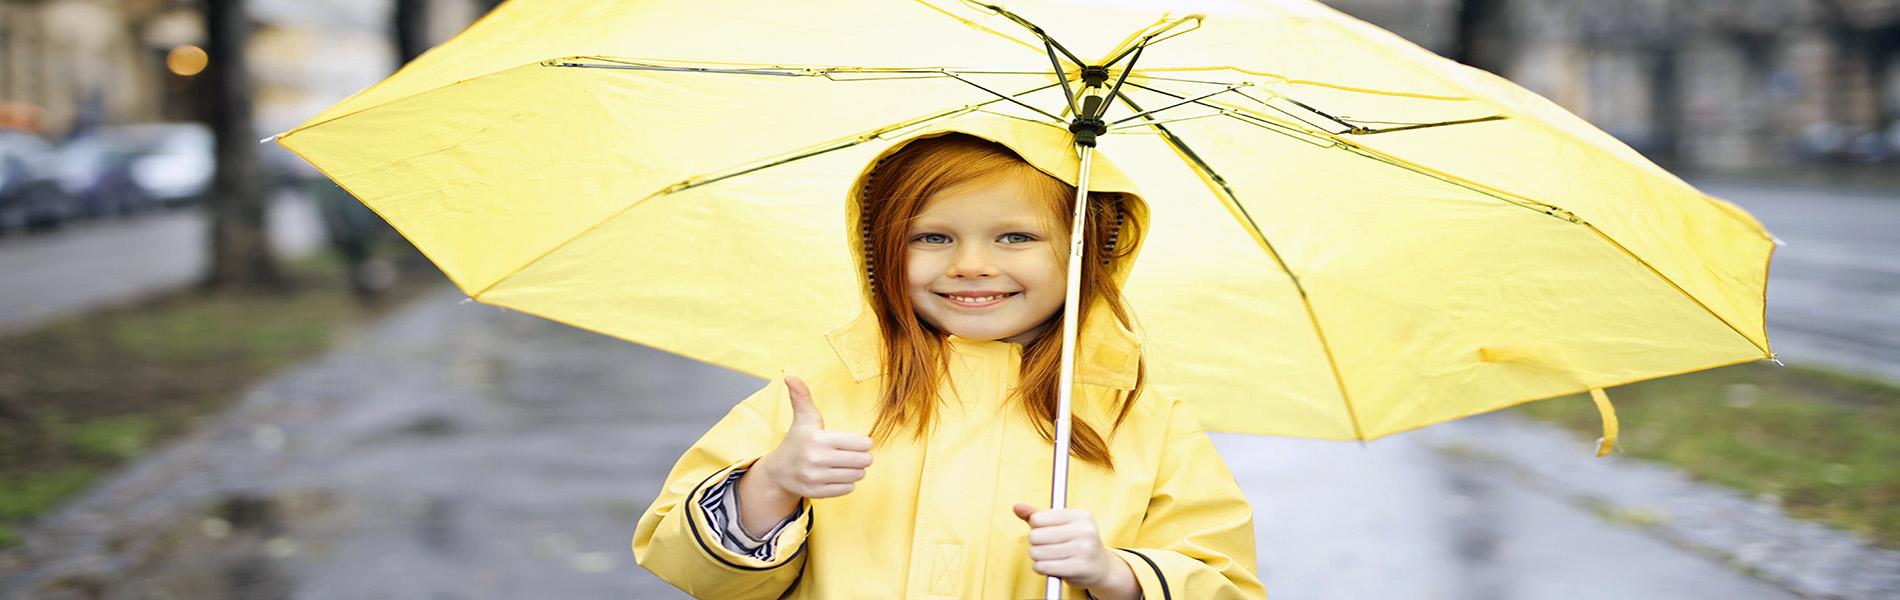 photo-of-smiling-girl-in-yellow-raincoat